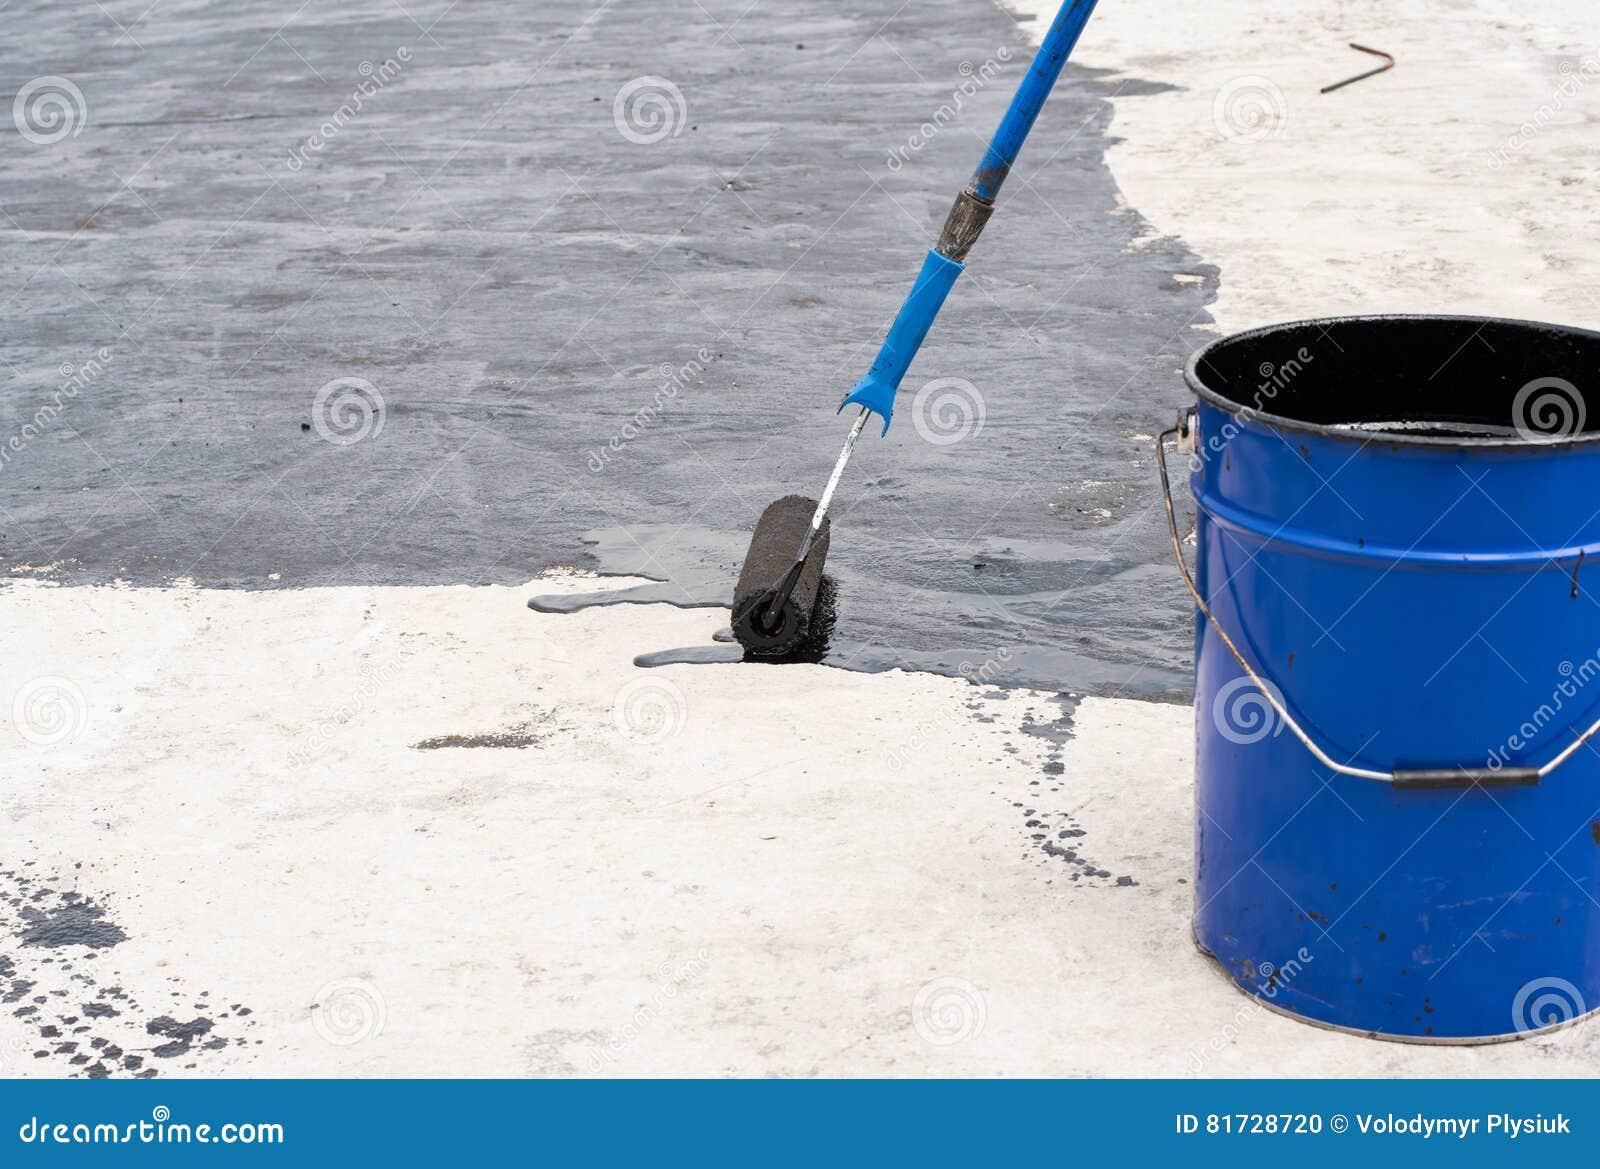 roller brush waterproofing stock photo image of black 81728720